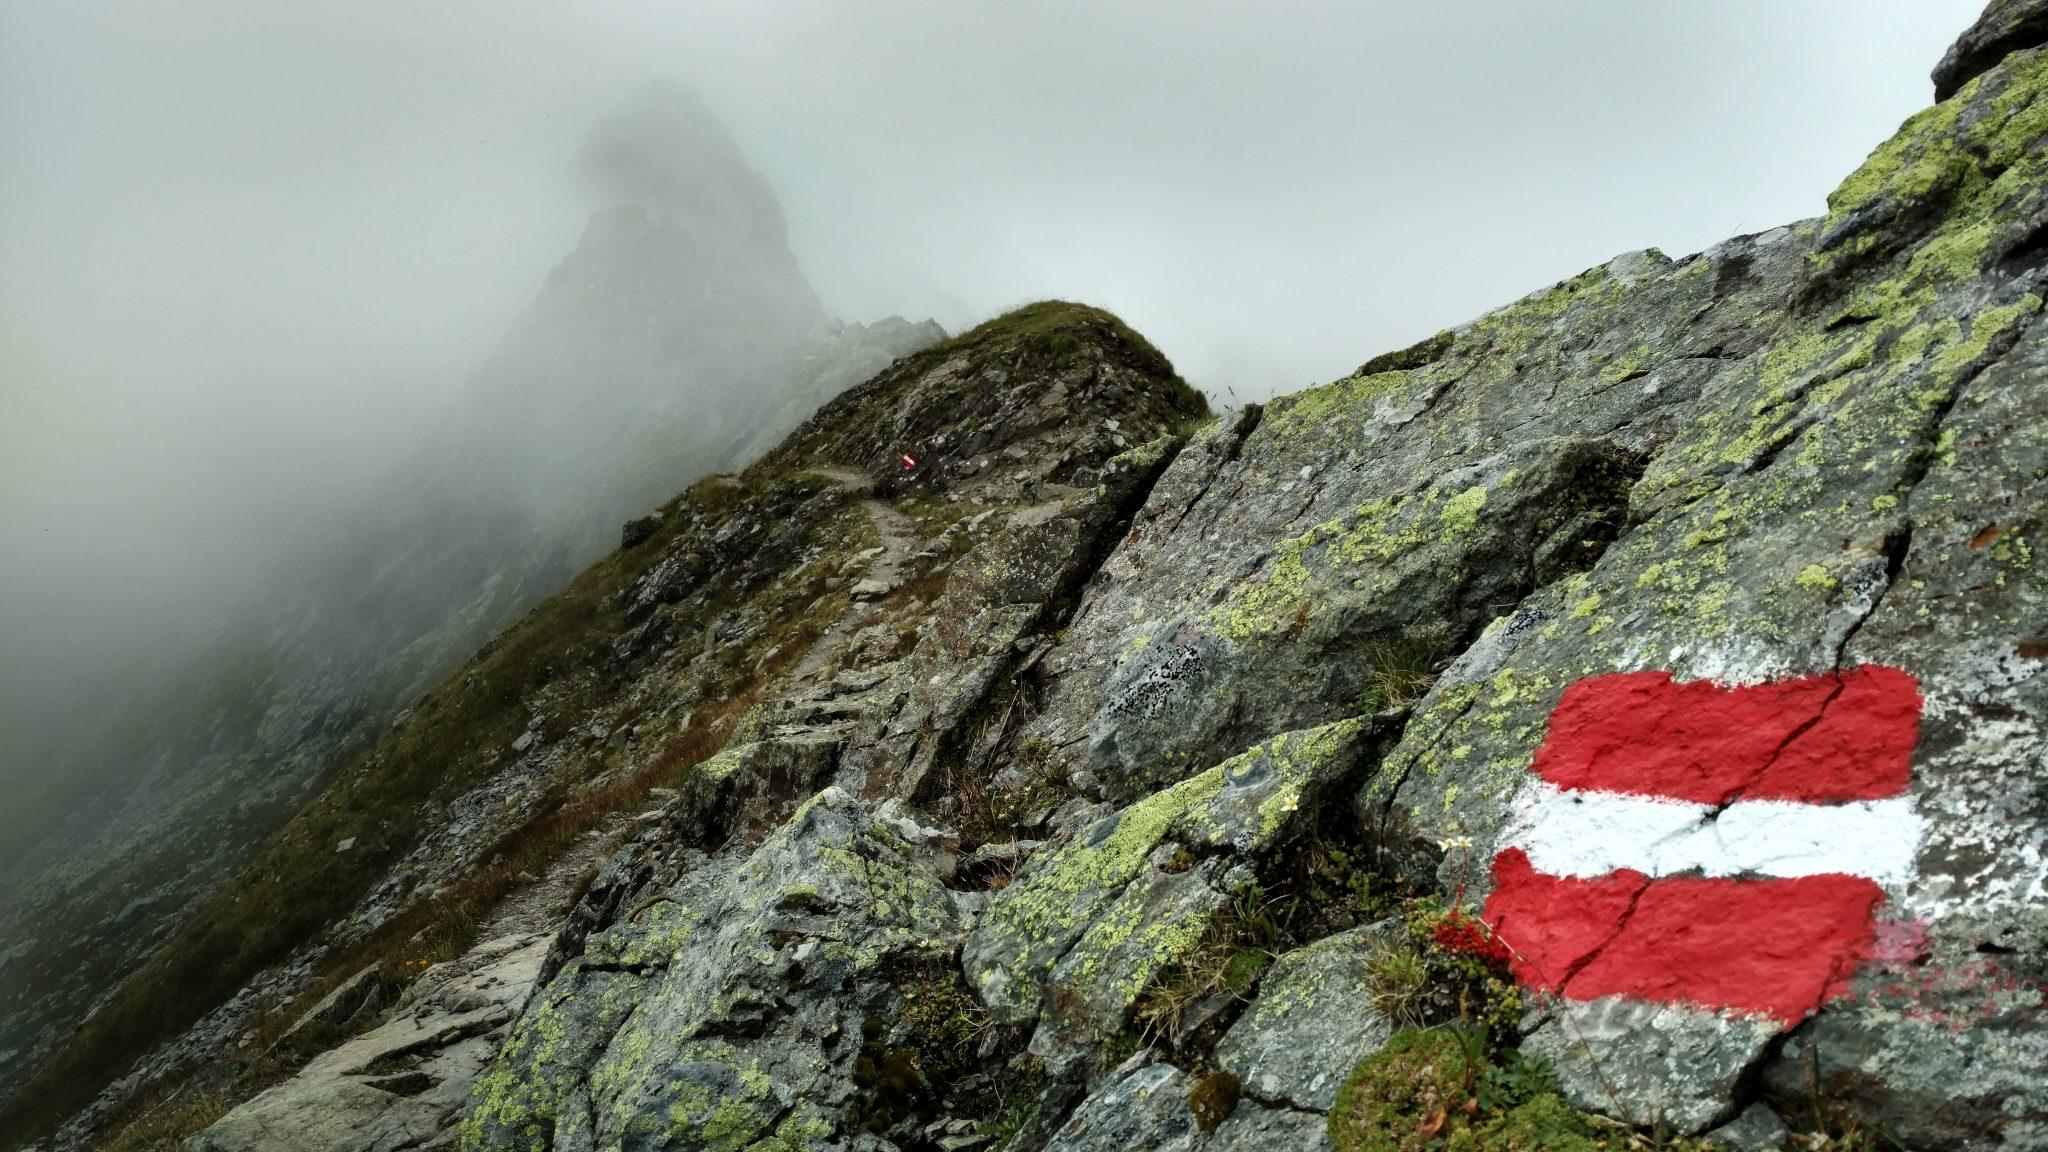 Up_to_Filmoor_via_alpina